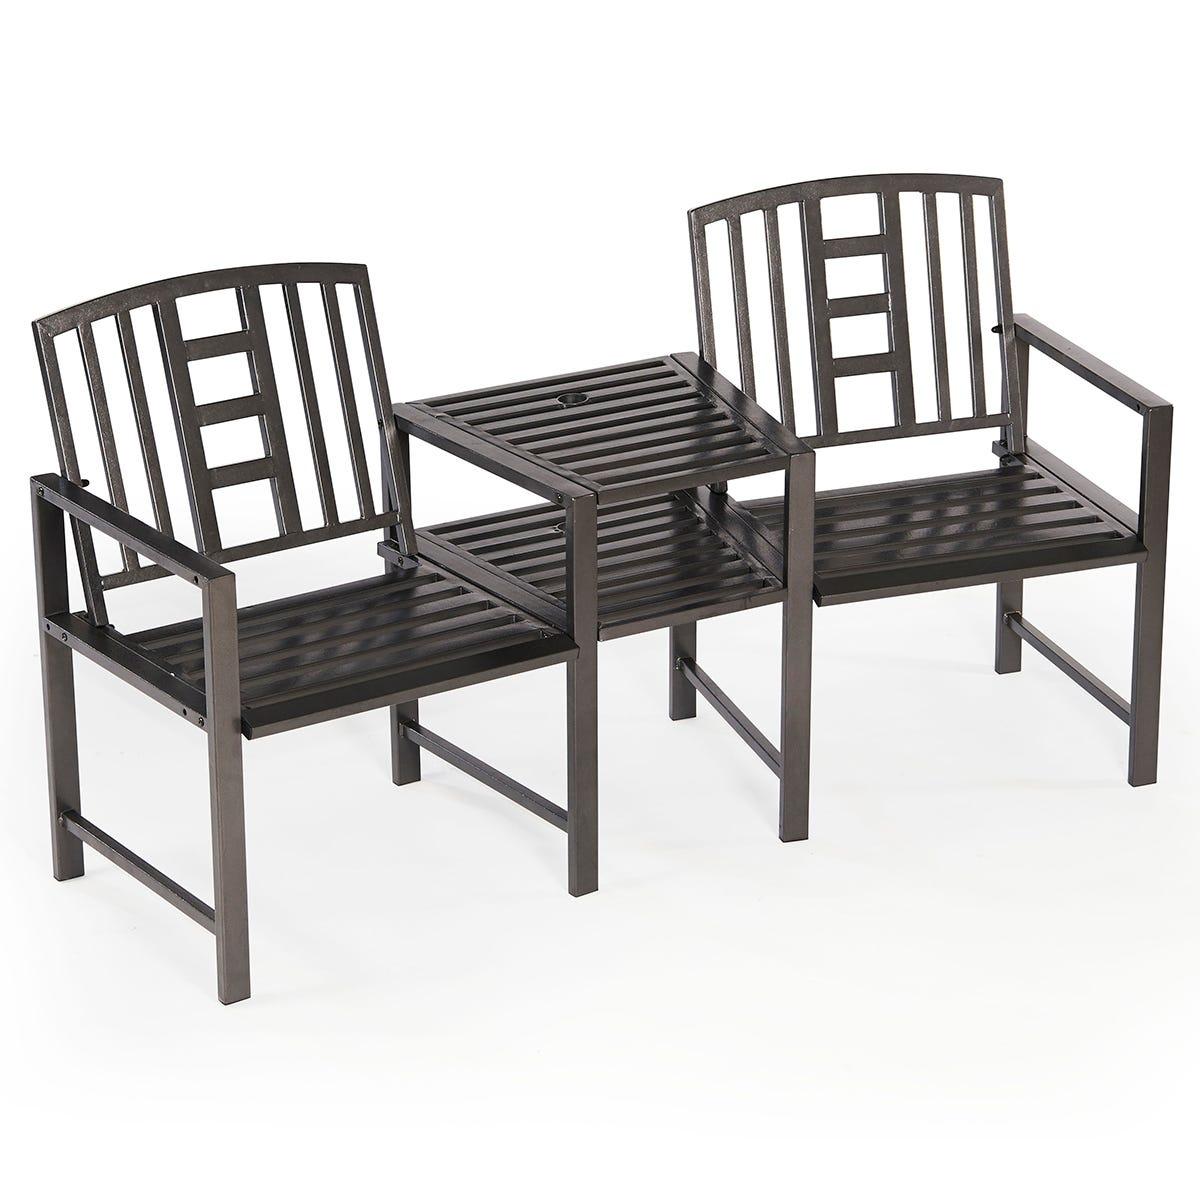 Greenhurst Hartlebury Duo Garden Bench and Table